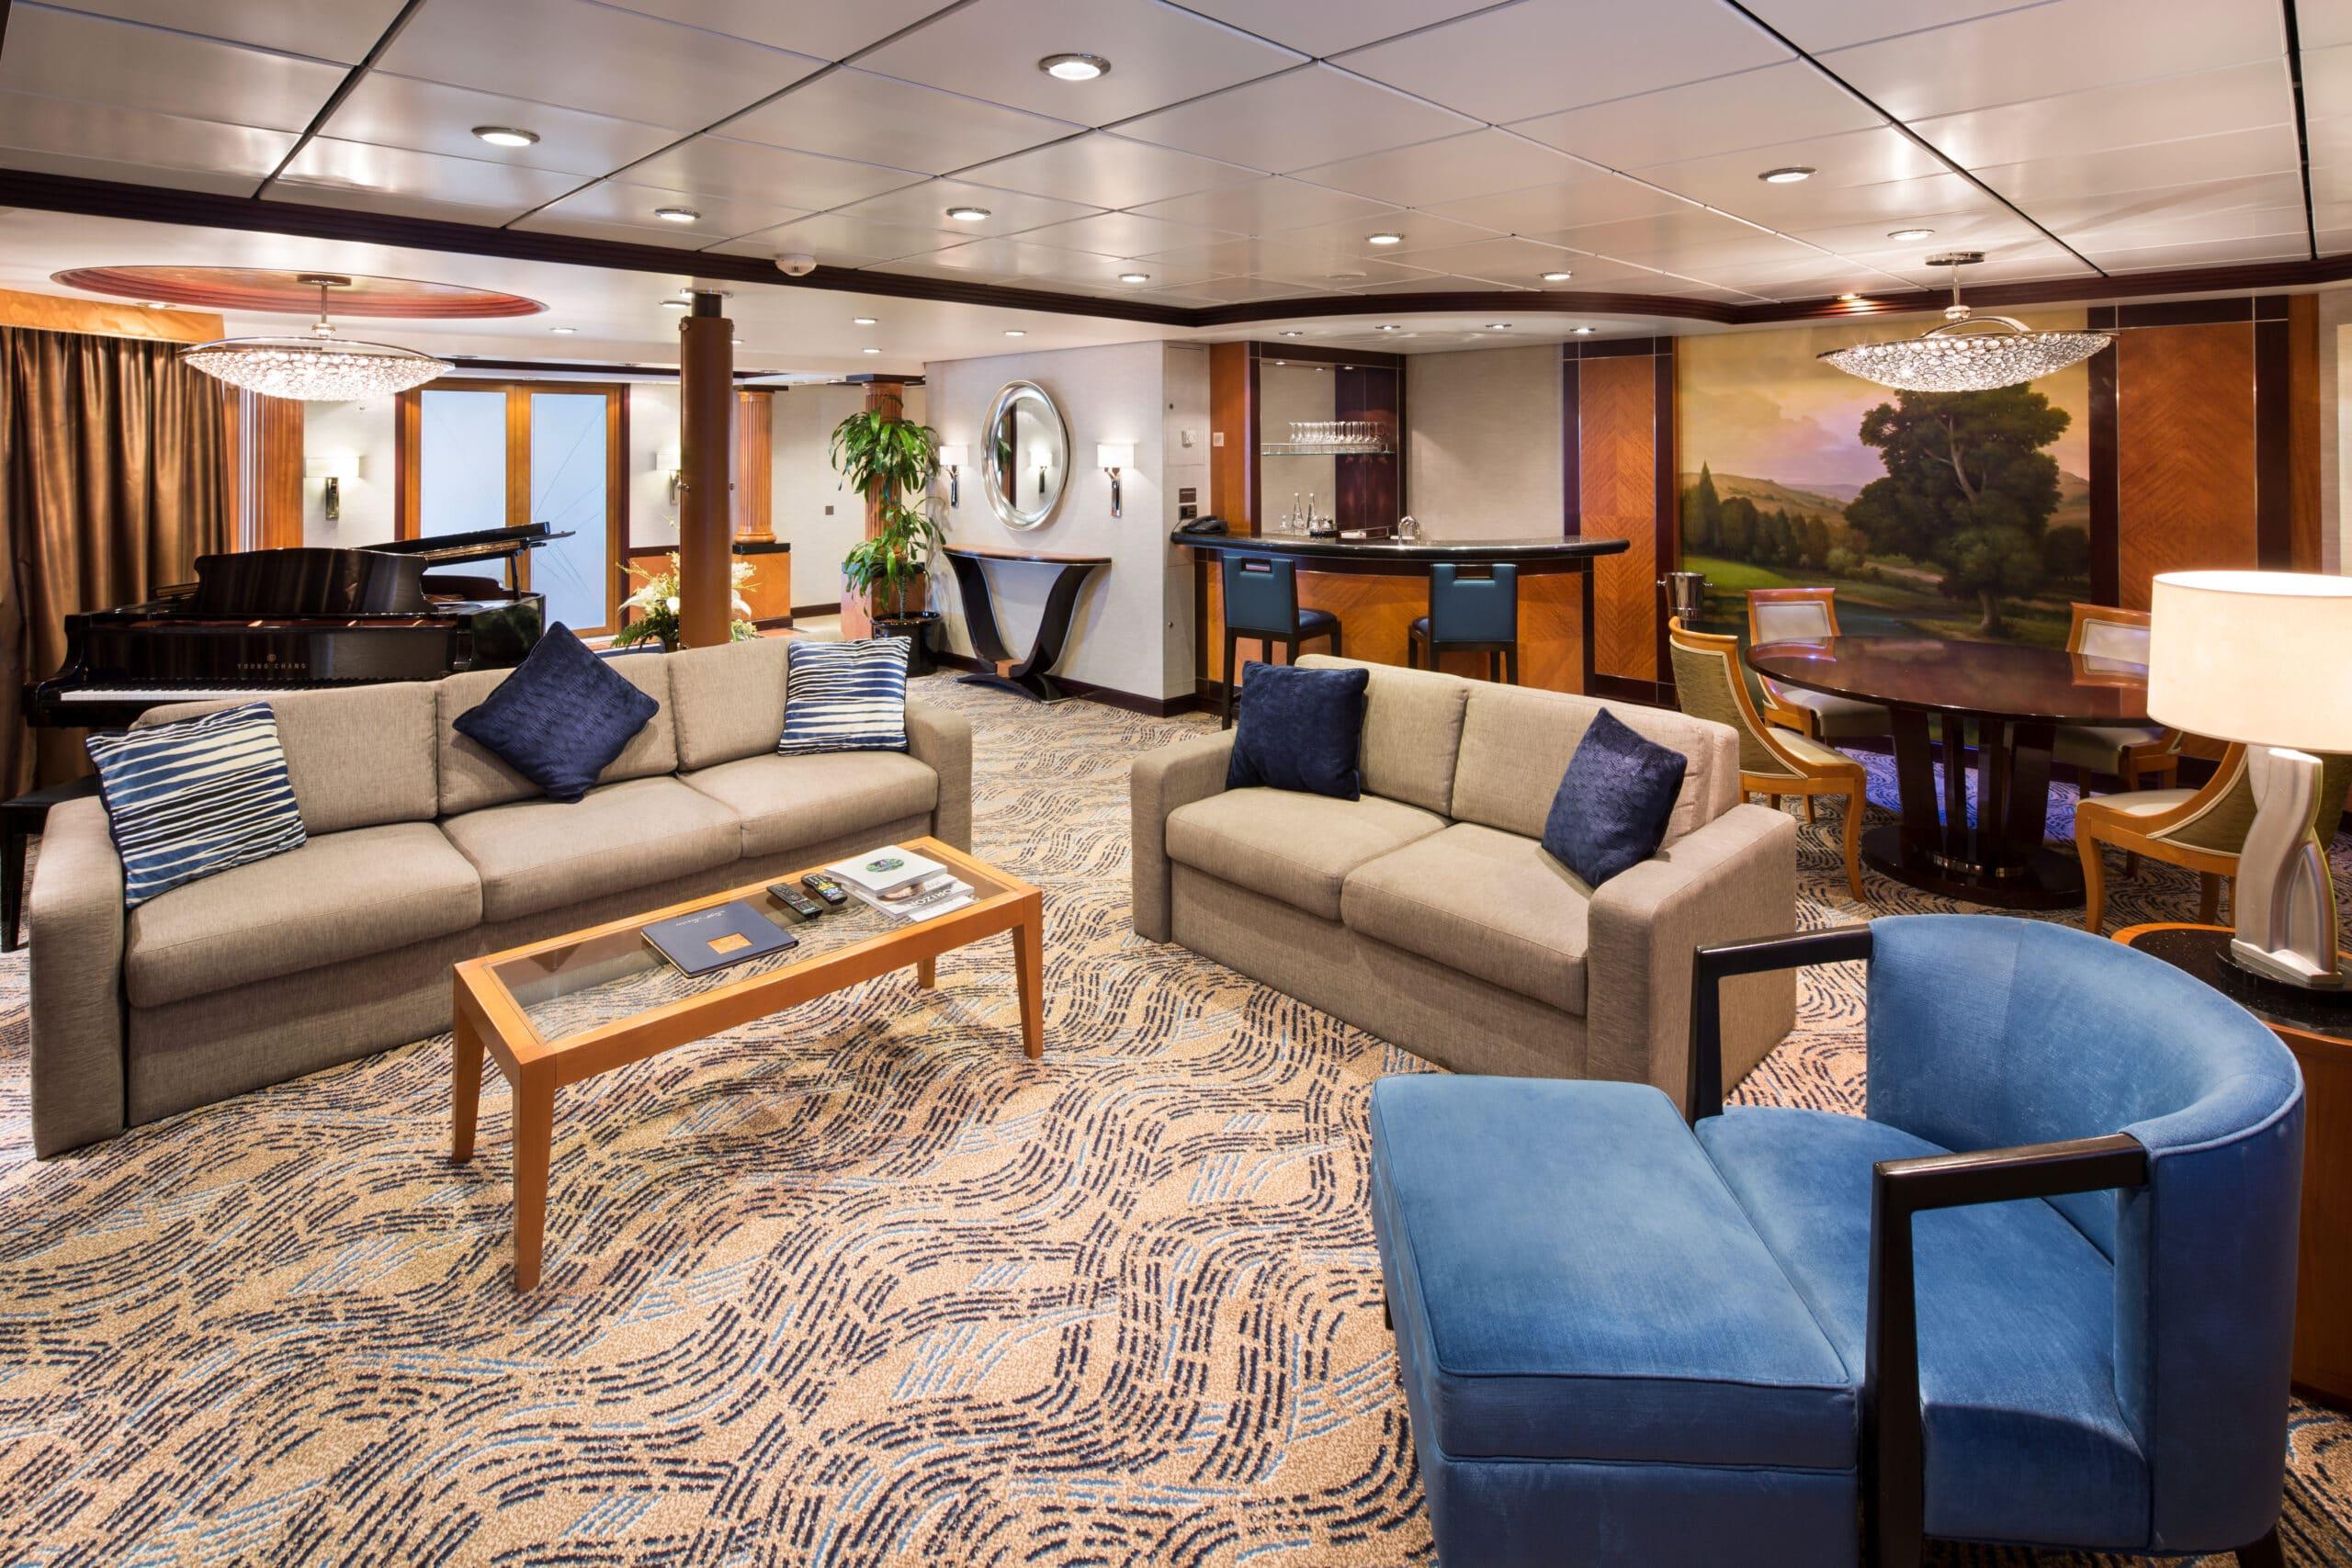 Royal-Caribbean-International-Navigator-of-the-Seas-Voyager-of-the Seas-schip-cruiseschip-categorie RS-Royal Suite